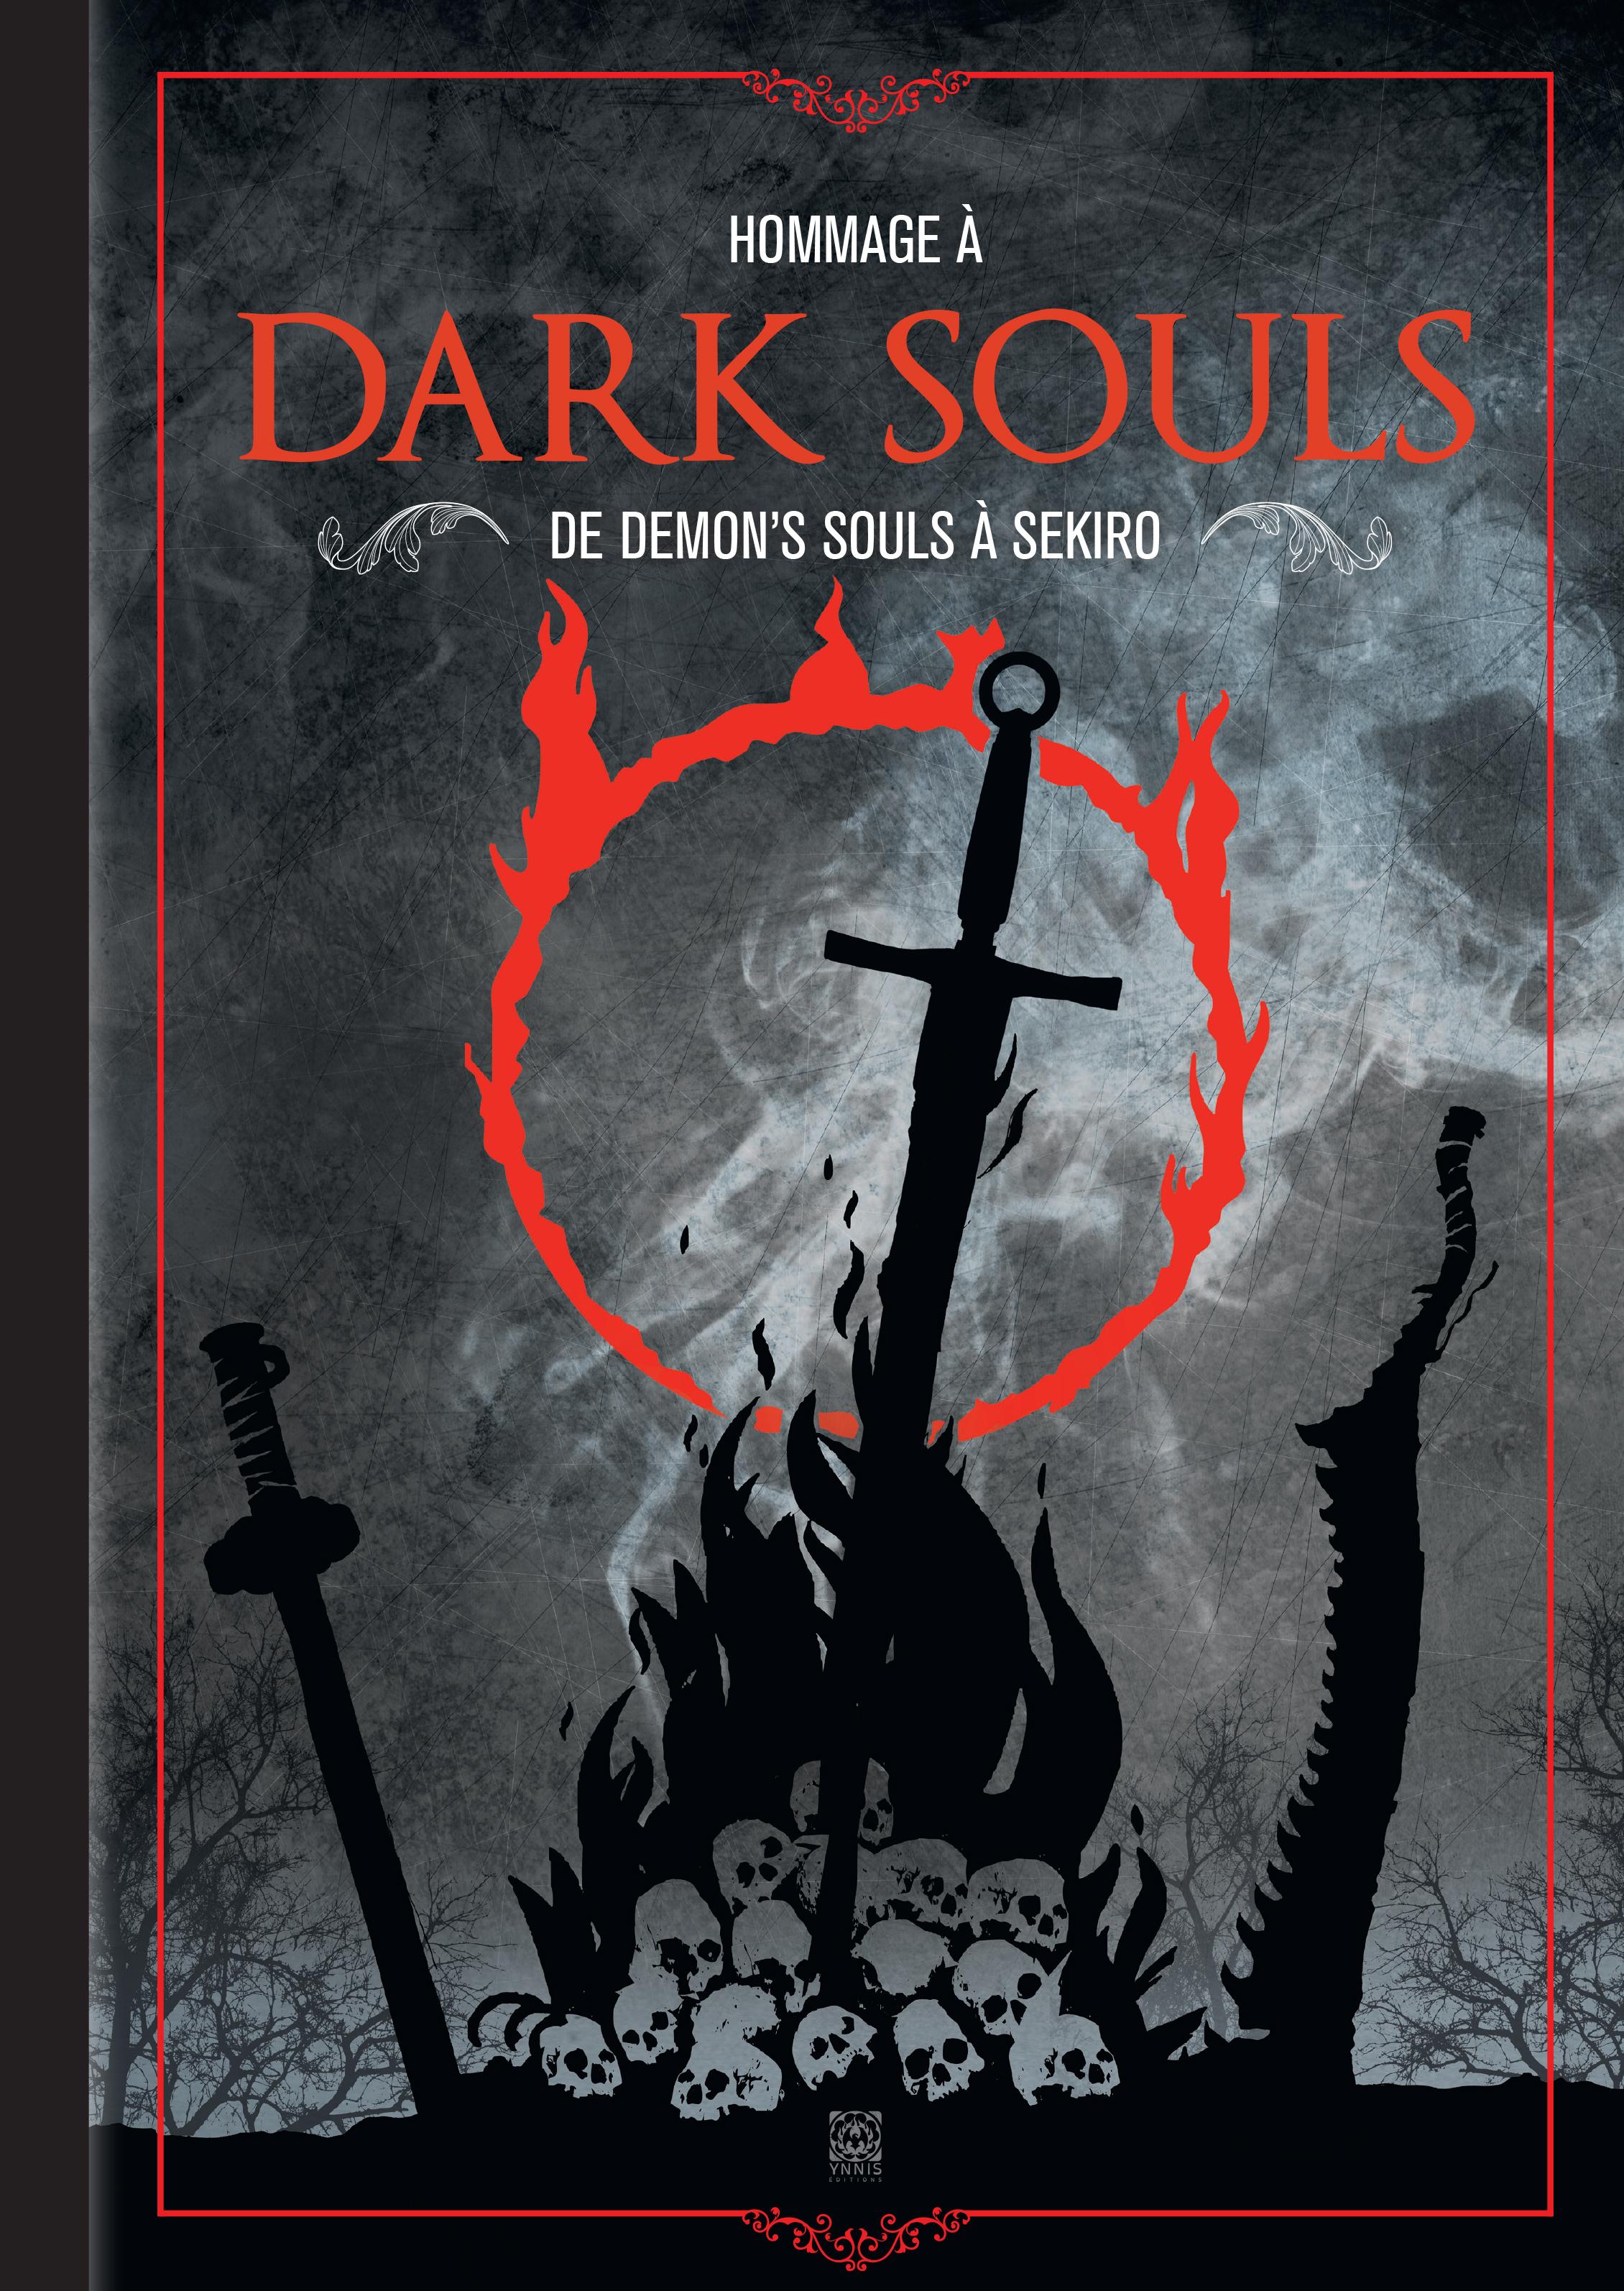 hommage_DarkSouls_C1